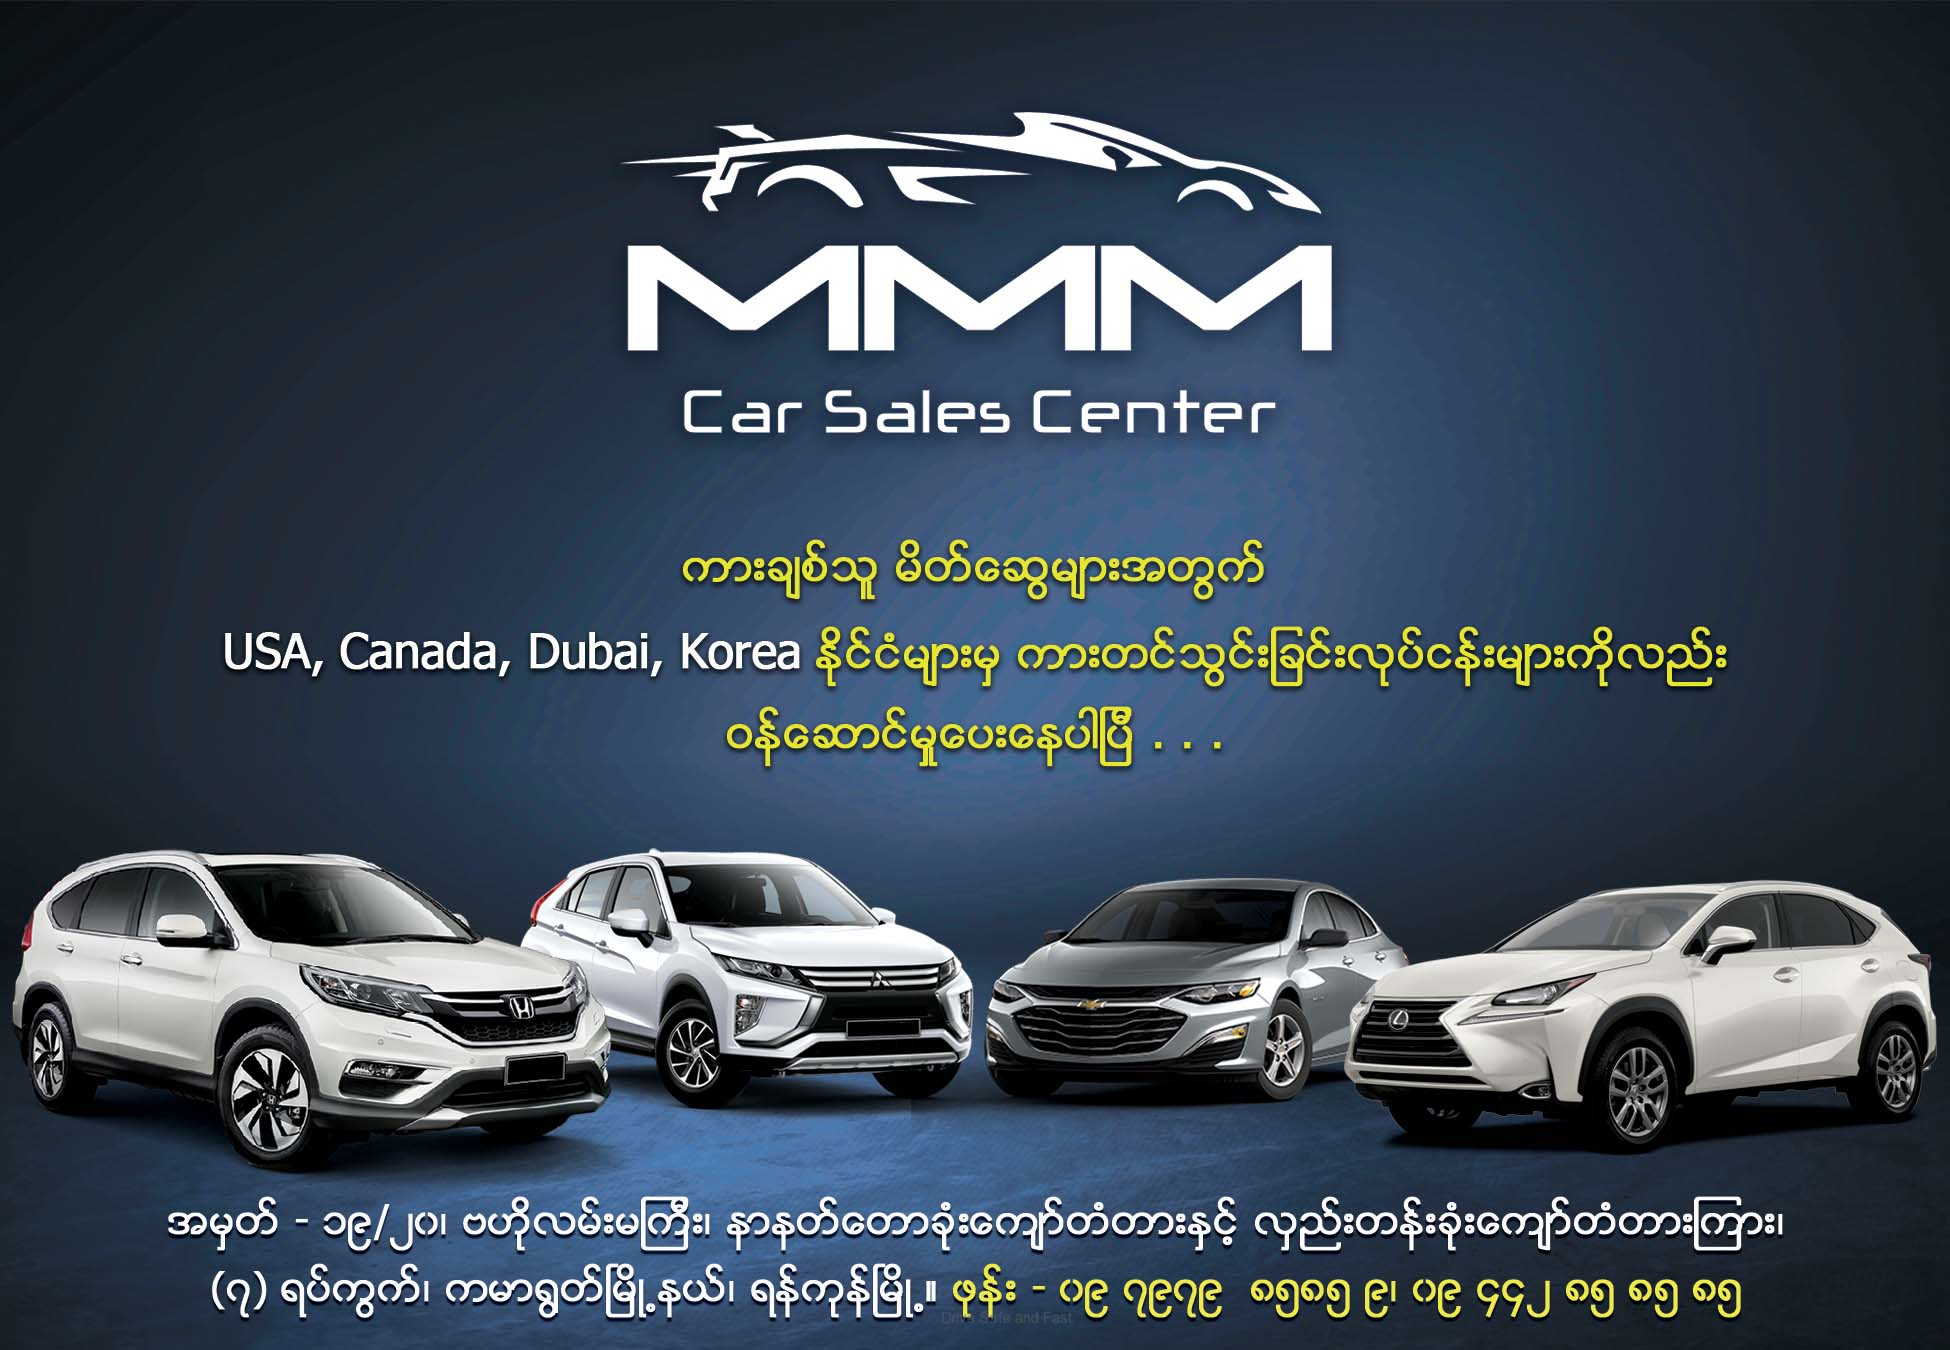 MMM Car Service